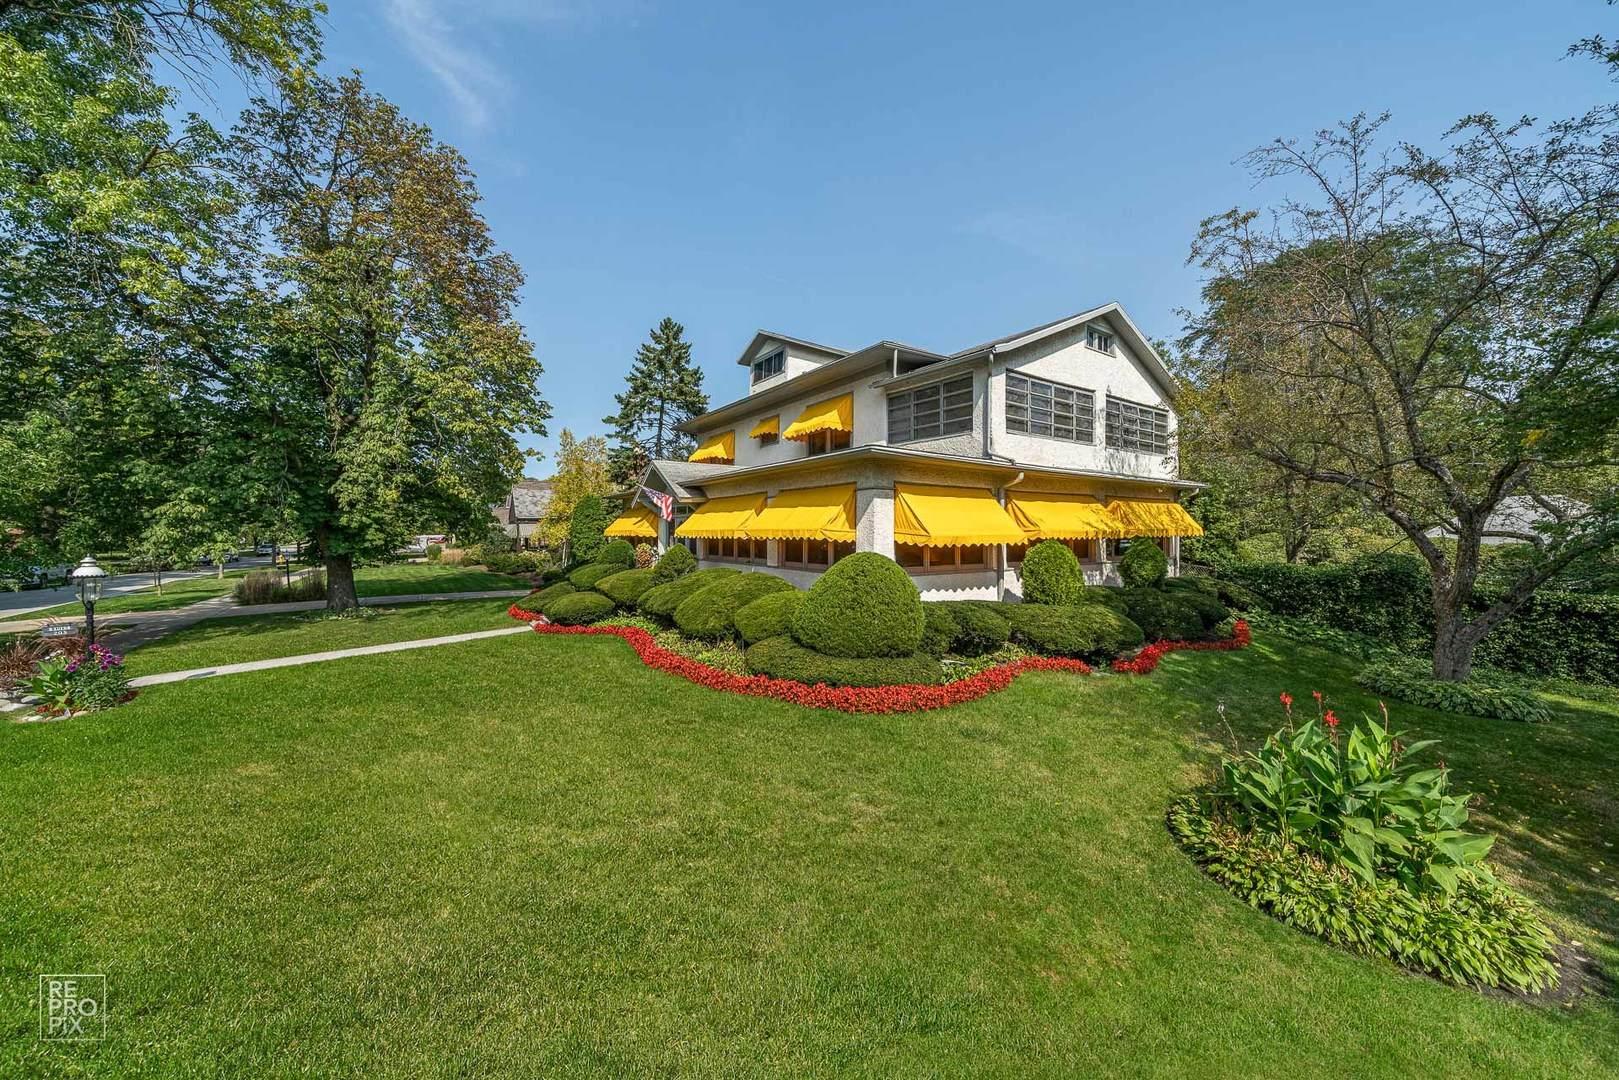 203 N Ashland Avenue, Park Ridge, IL 60068 (MLS #10881654) :: Helen Oliveri Real Estate